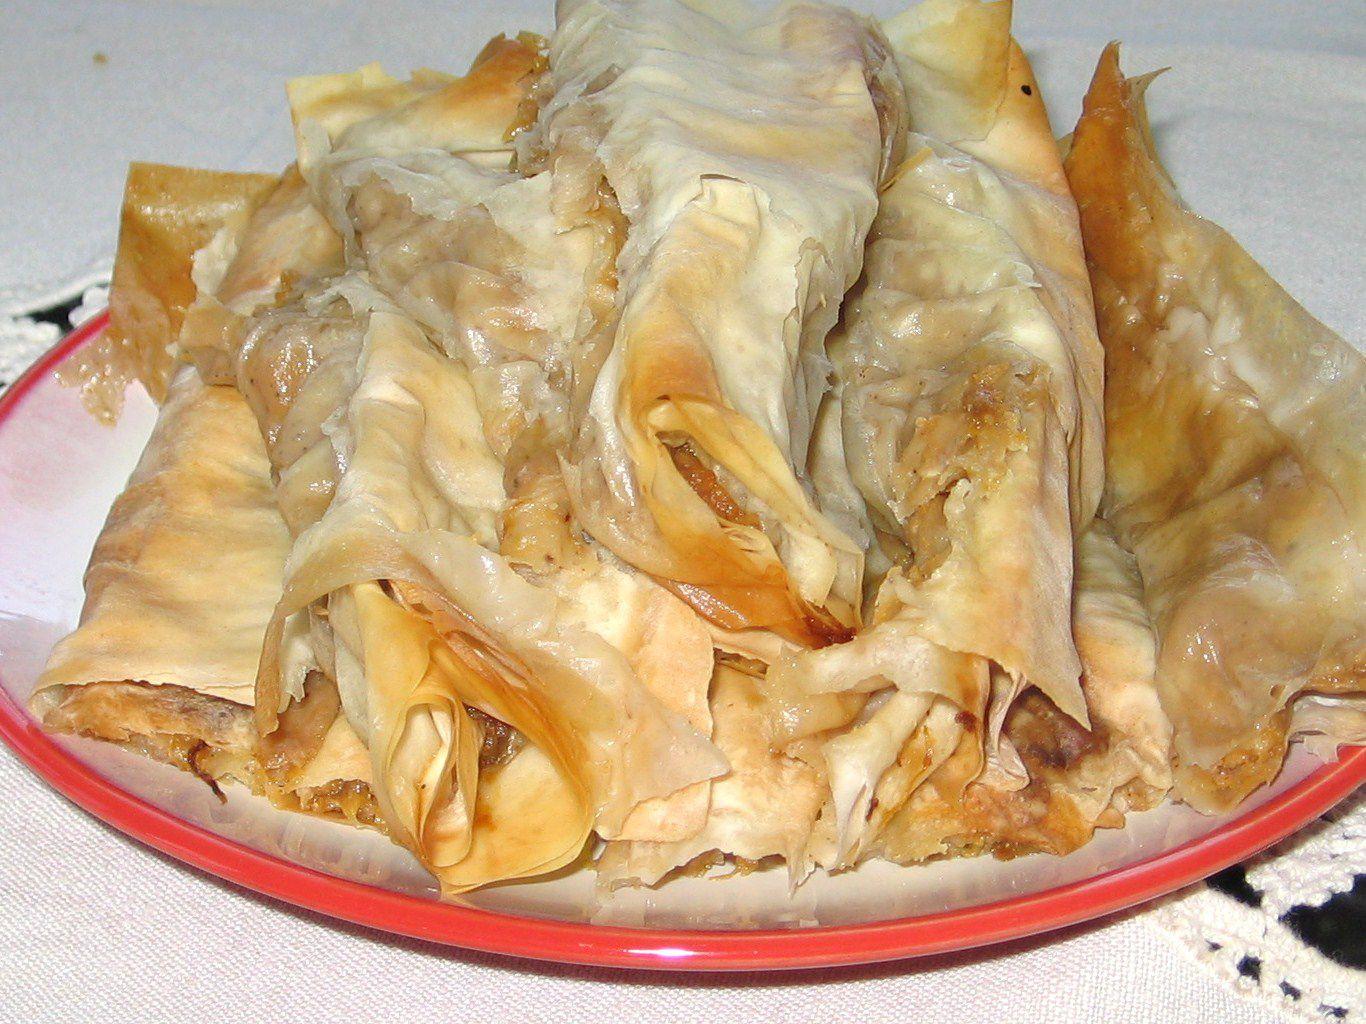 bulgarian dessert recipes in english Bulgarian Desserts - Recipes and Descriptions